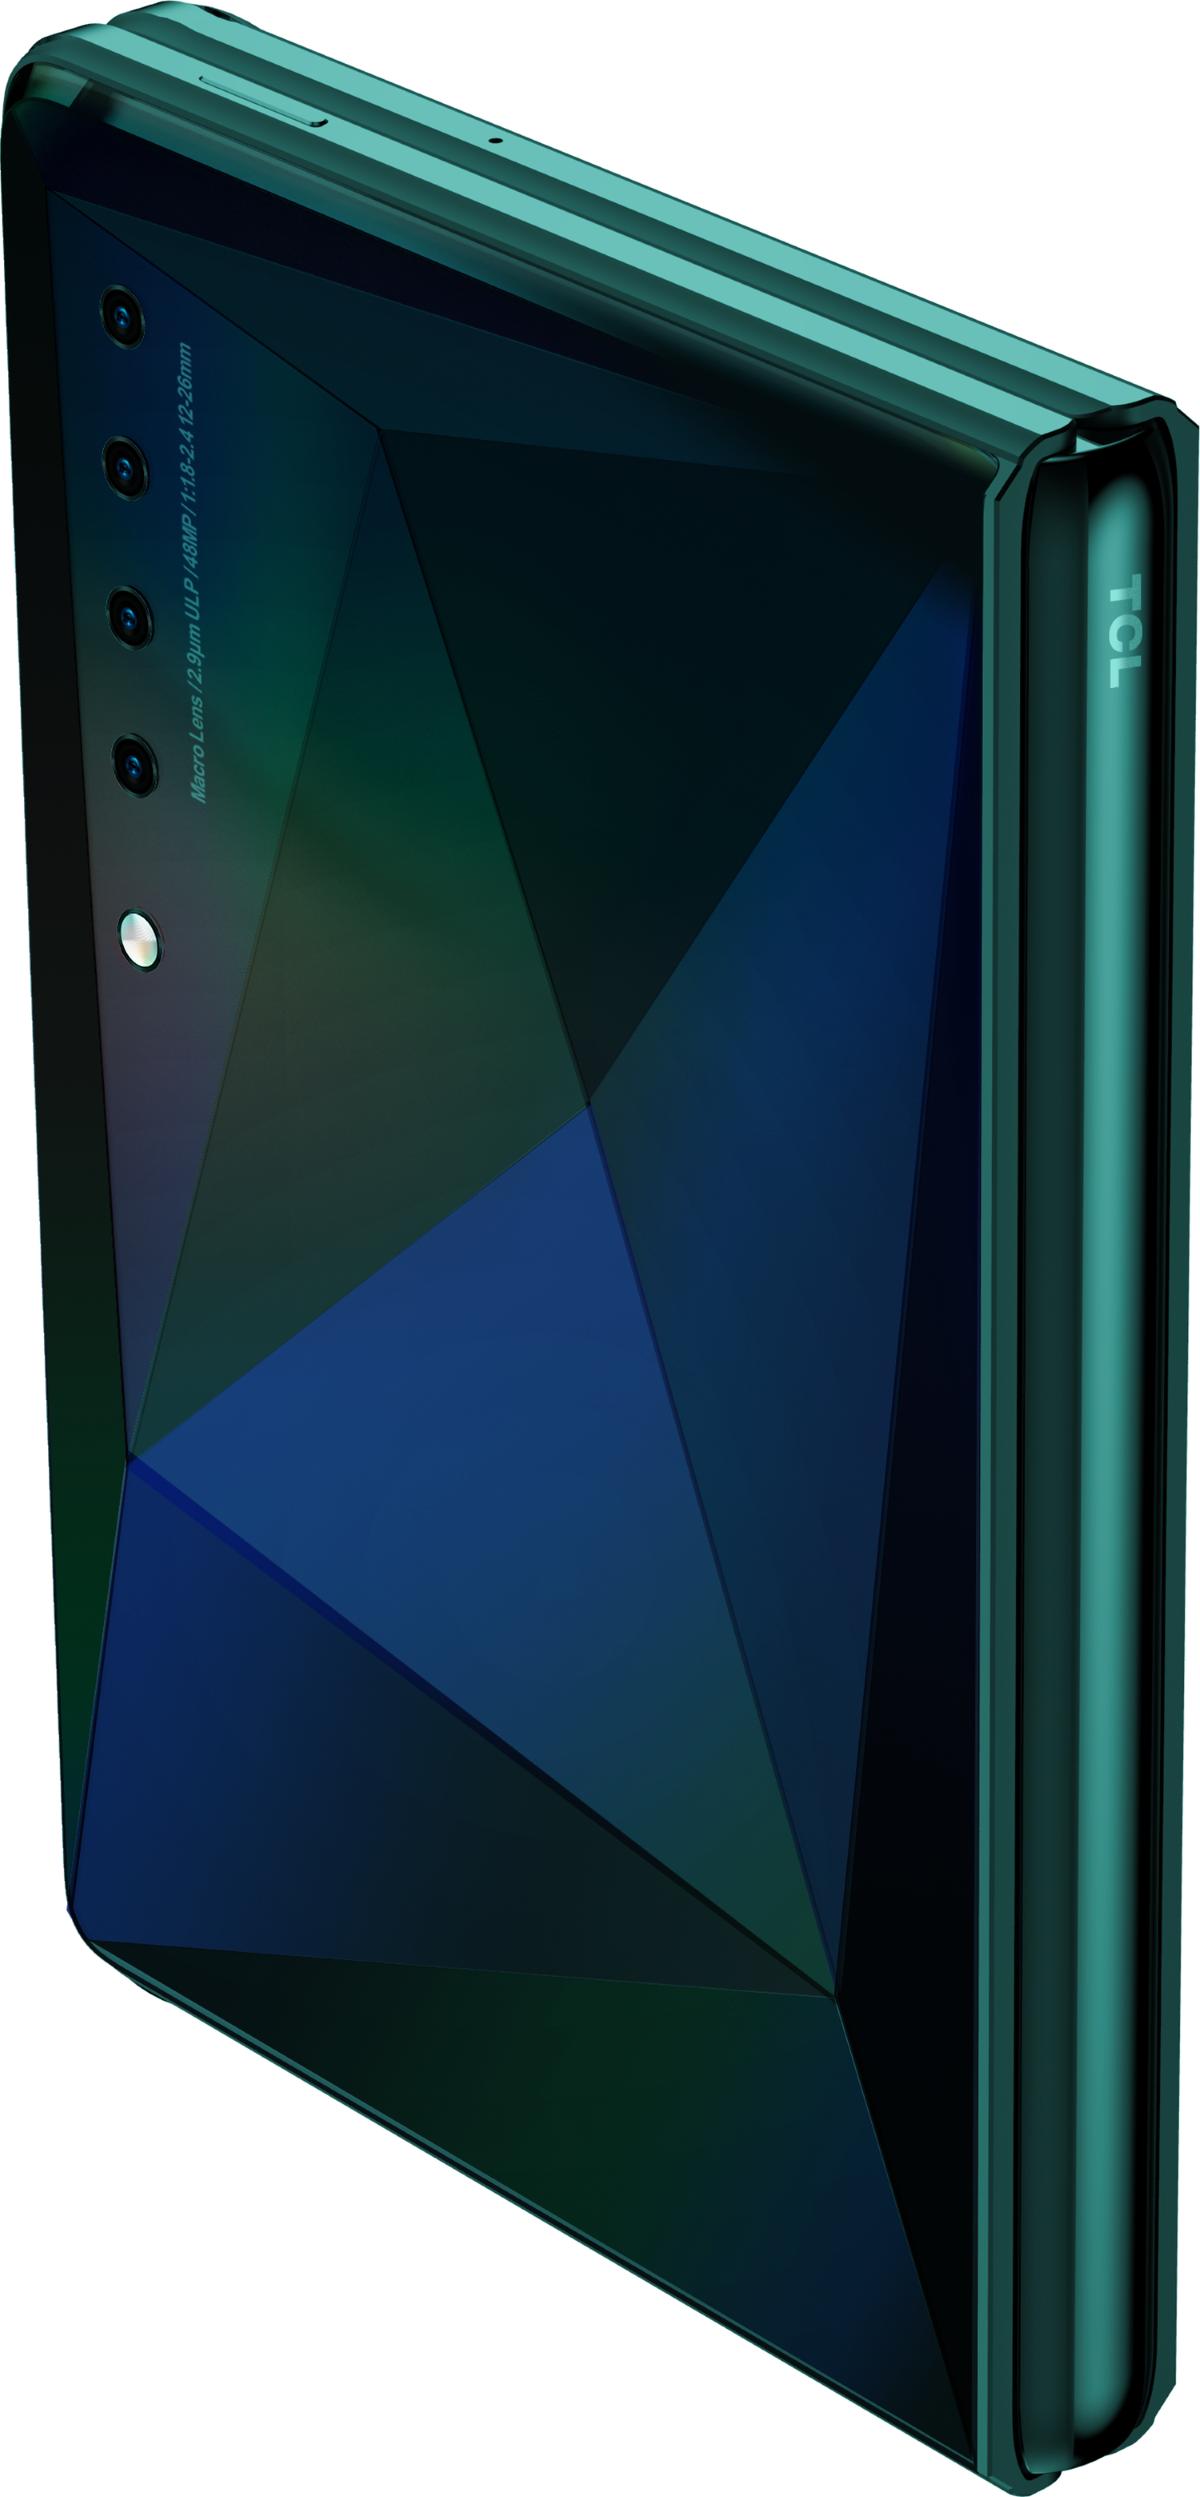 TCL - Foldable Smartphone Prototype (4)